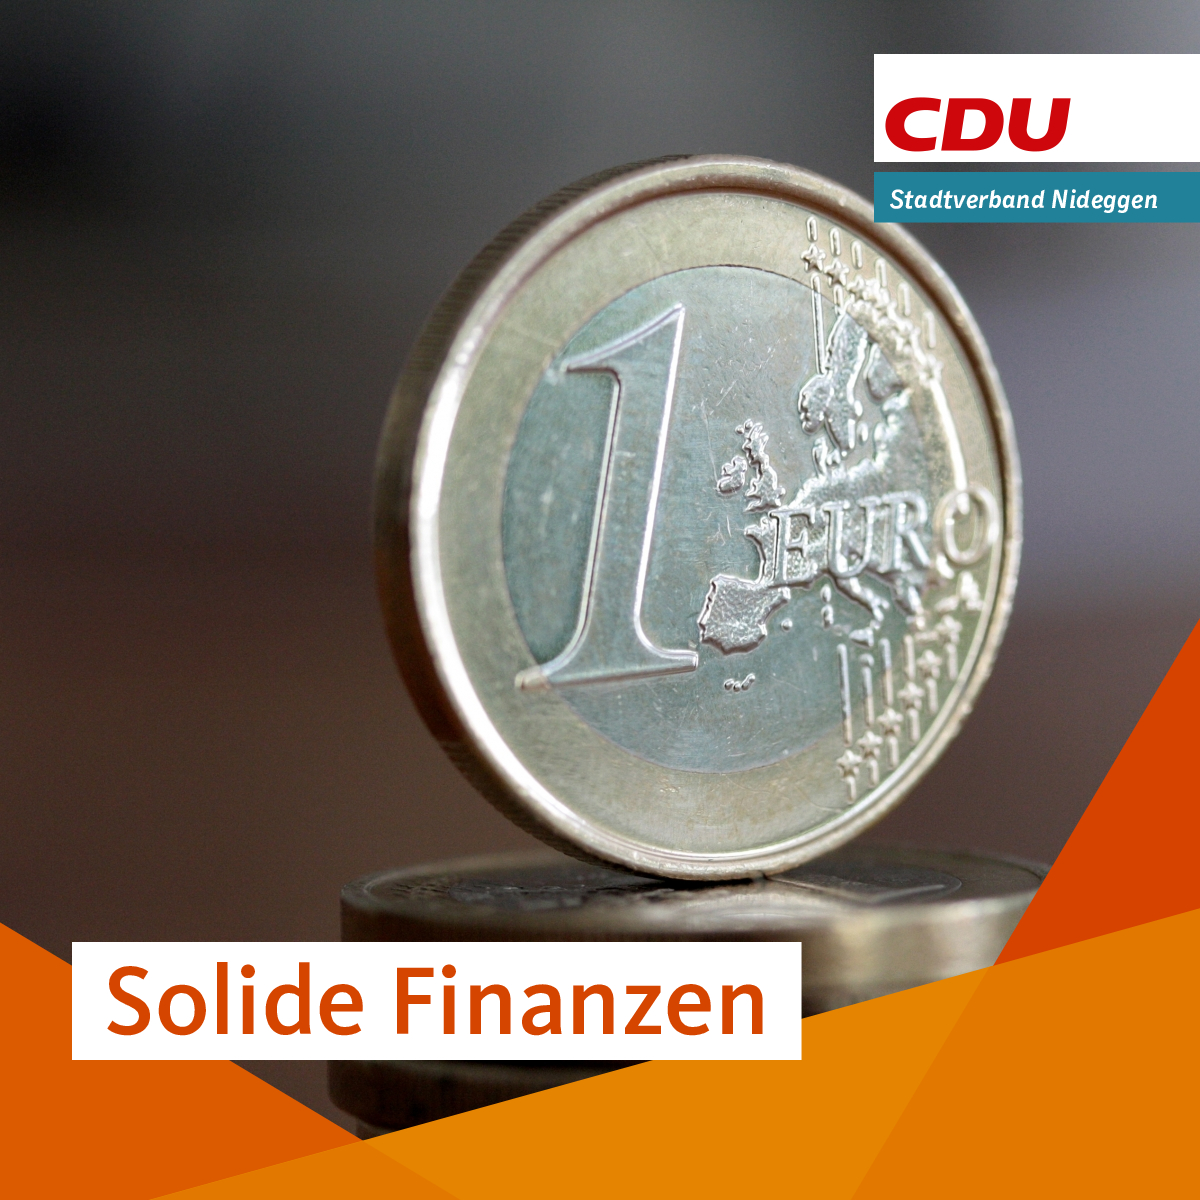 Solide Finanzen